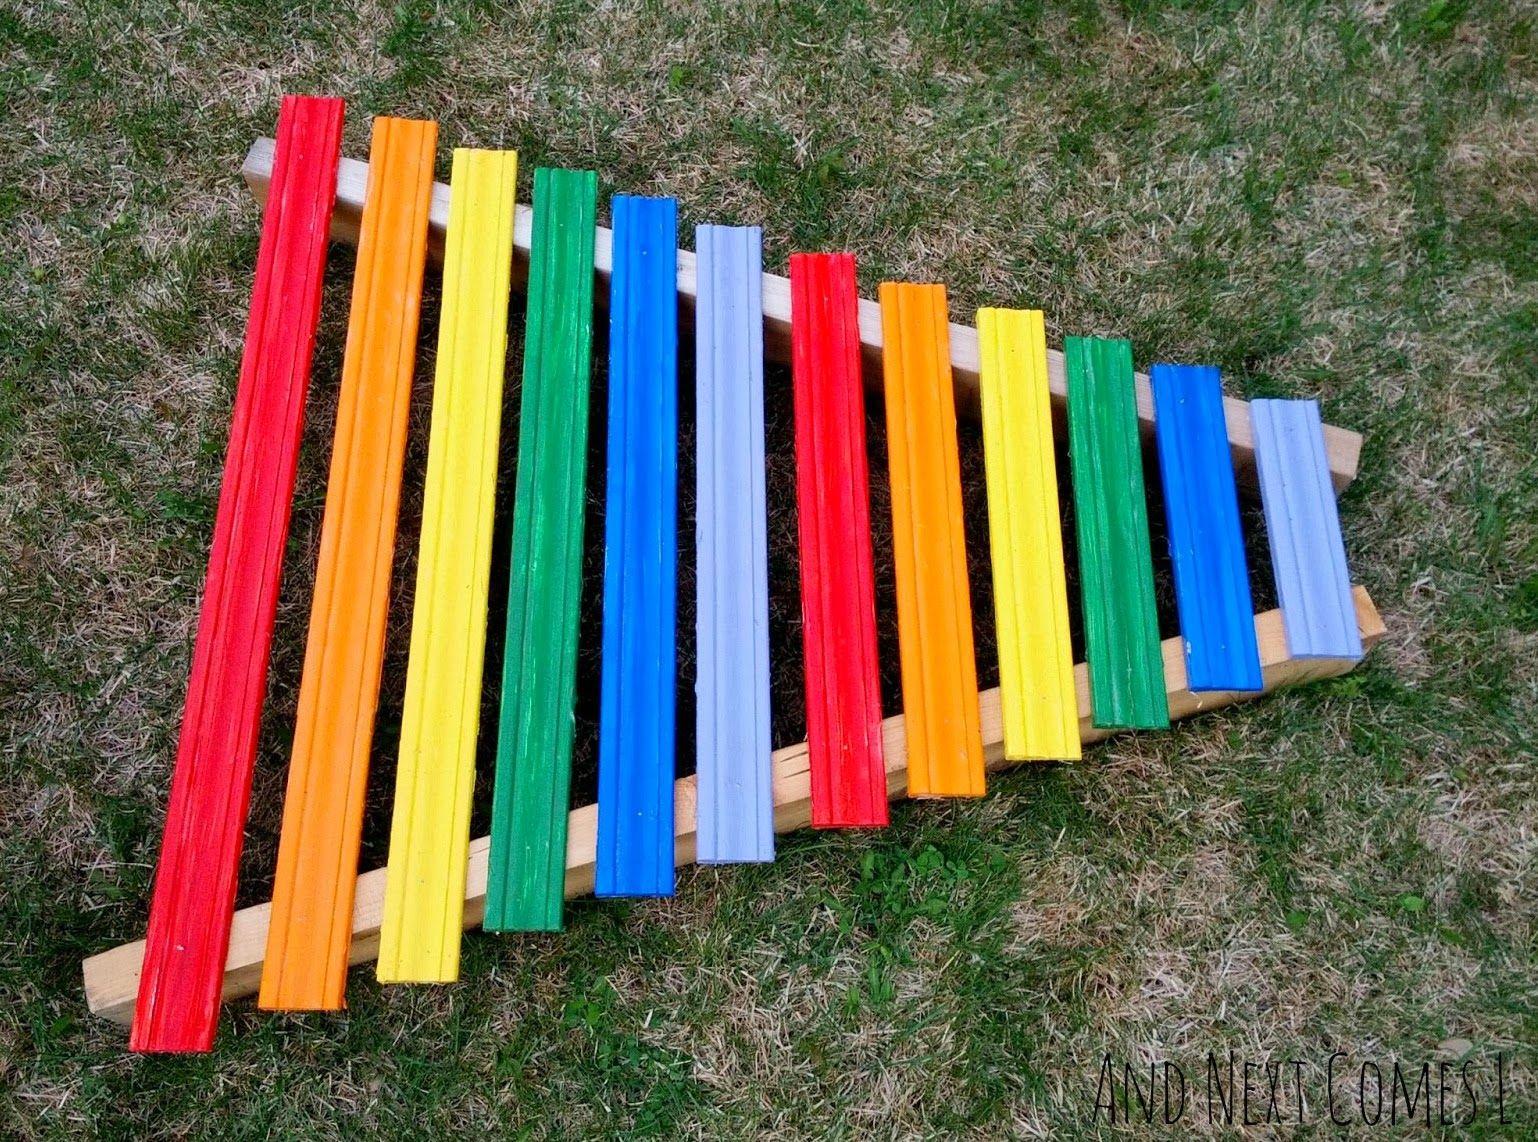 14 Diy Musical Instruments